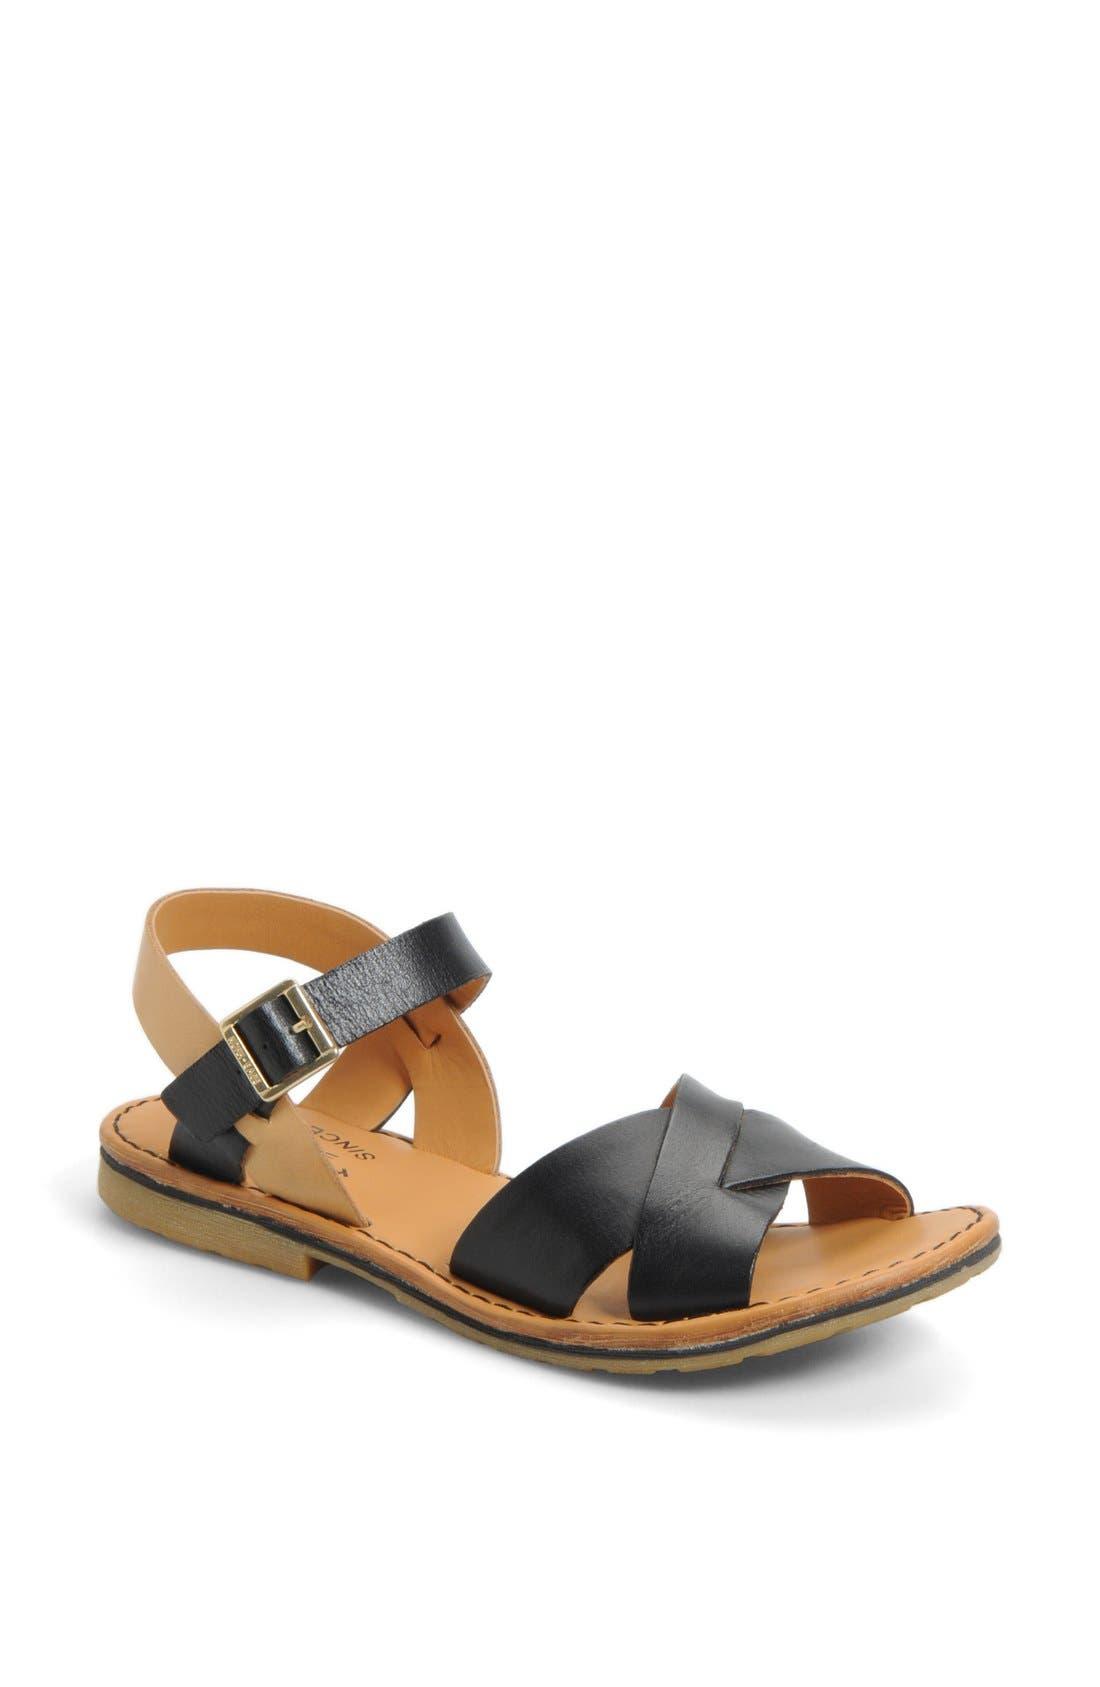 Main Image - Kork-Ease® 'Corine' Sandal (Women)